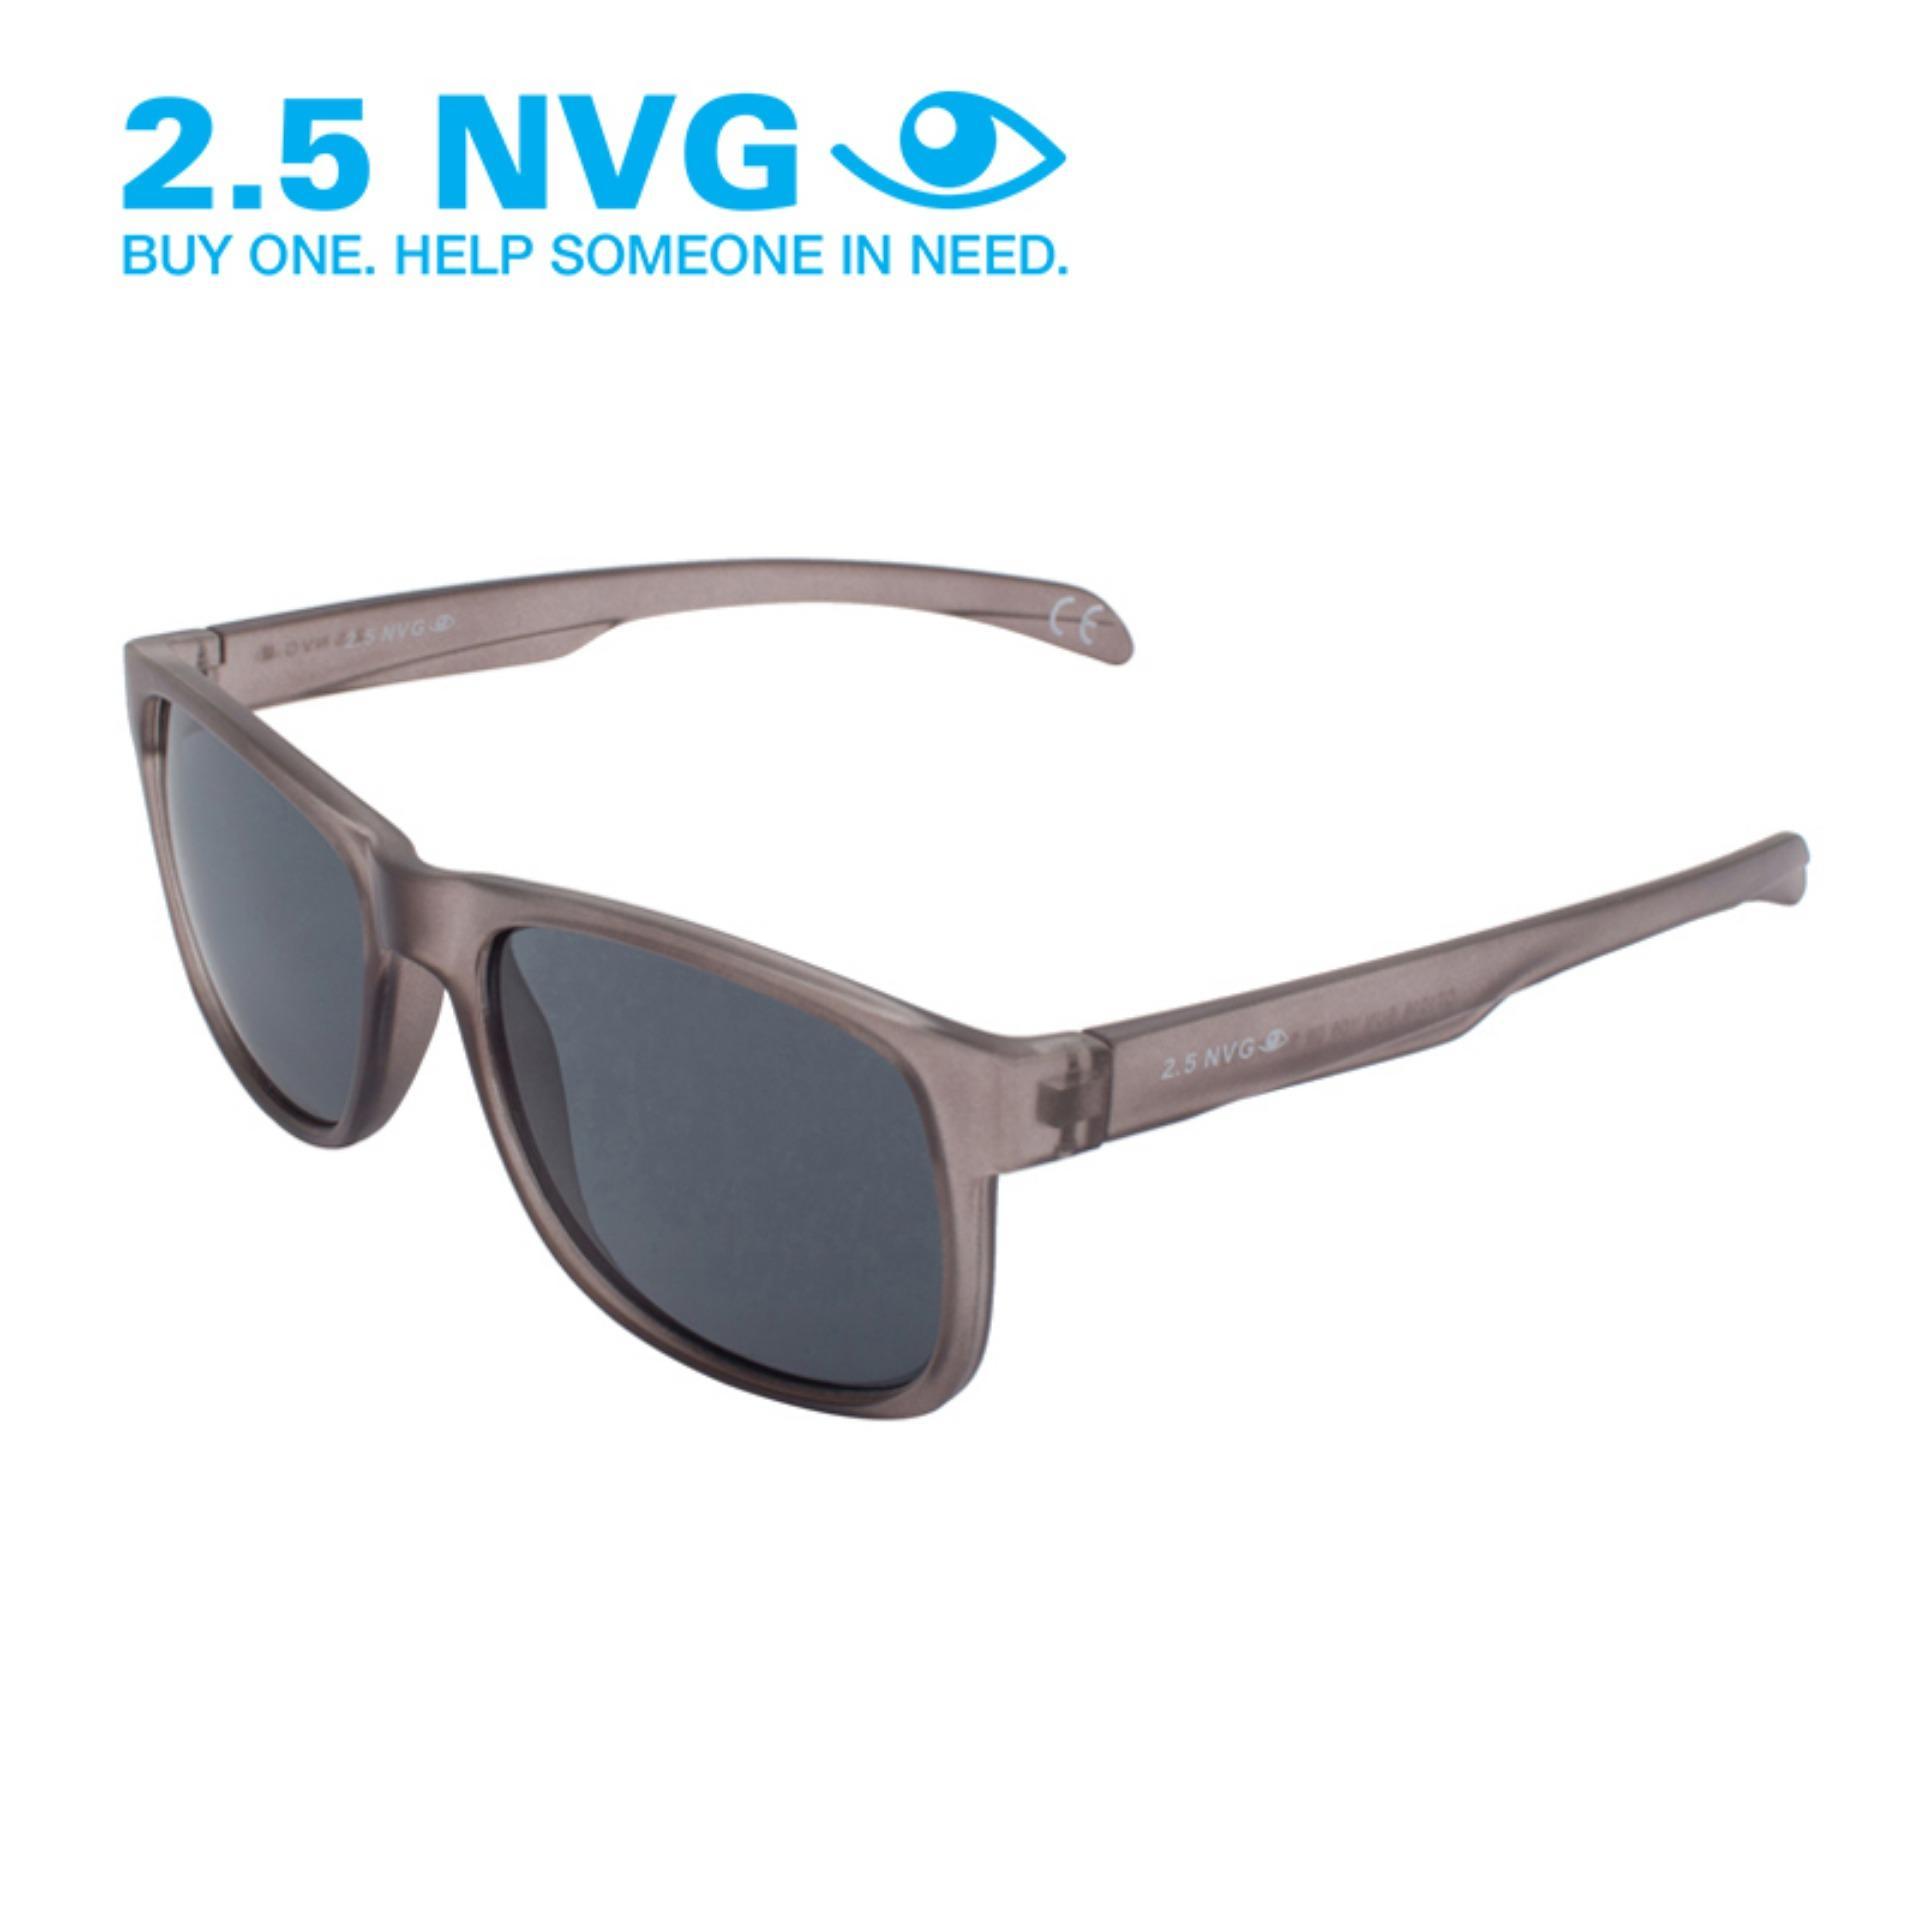 Jual 2 5 Nvg Kacamata Pria Cokelat Persegi Panjang Proteksi Uv 400 Lensa Hitam Sun 105 08 Satu Set